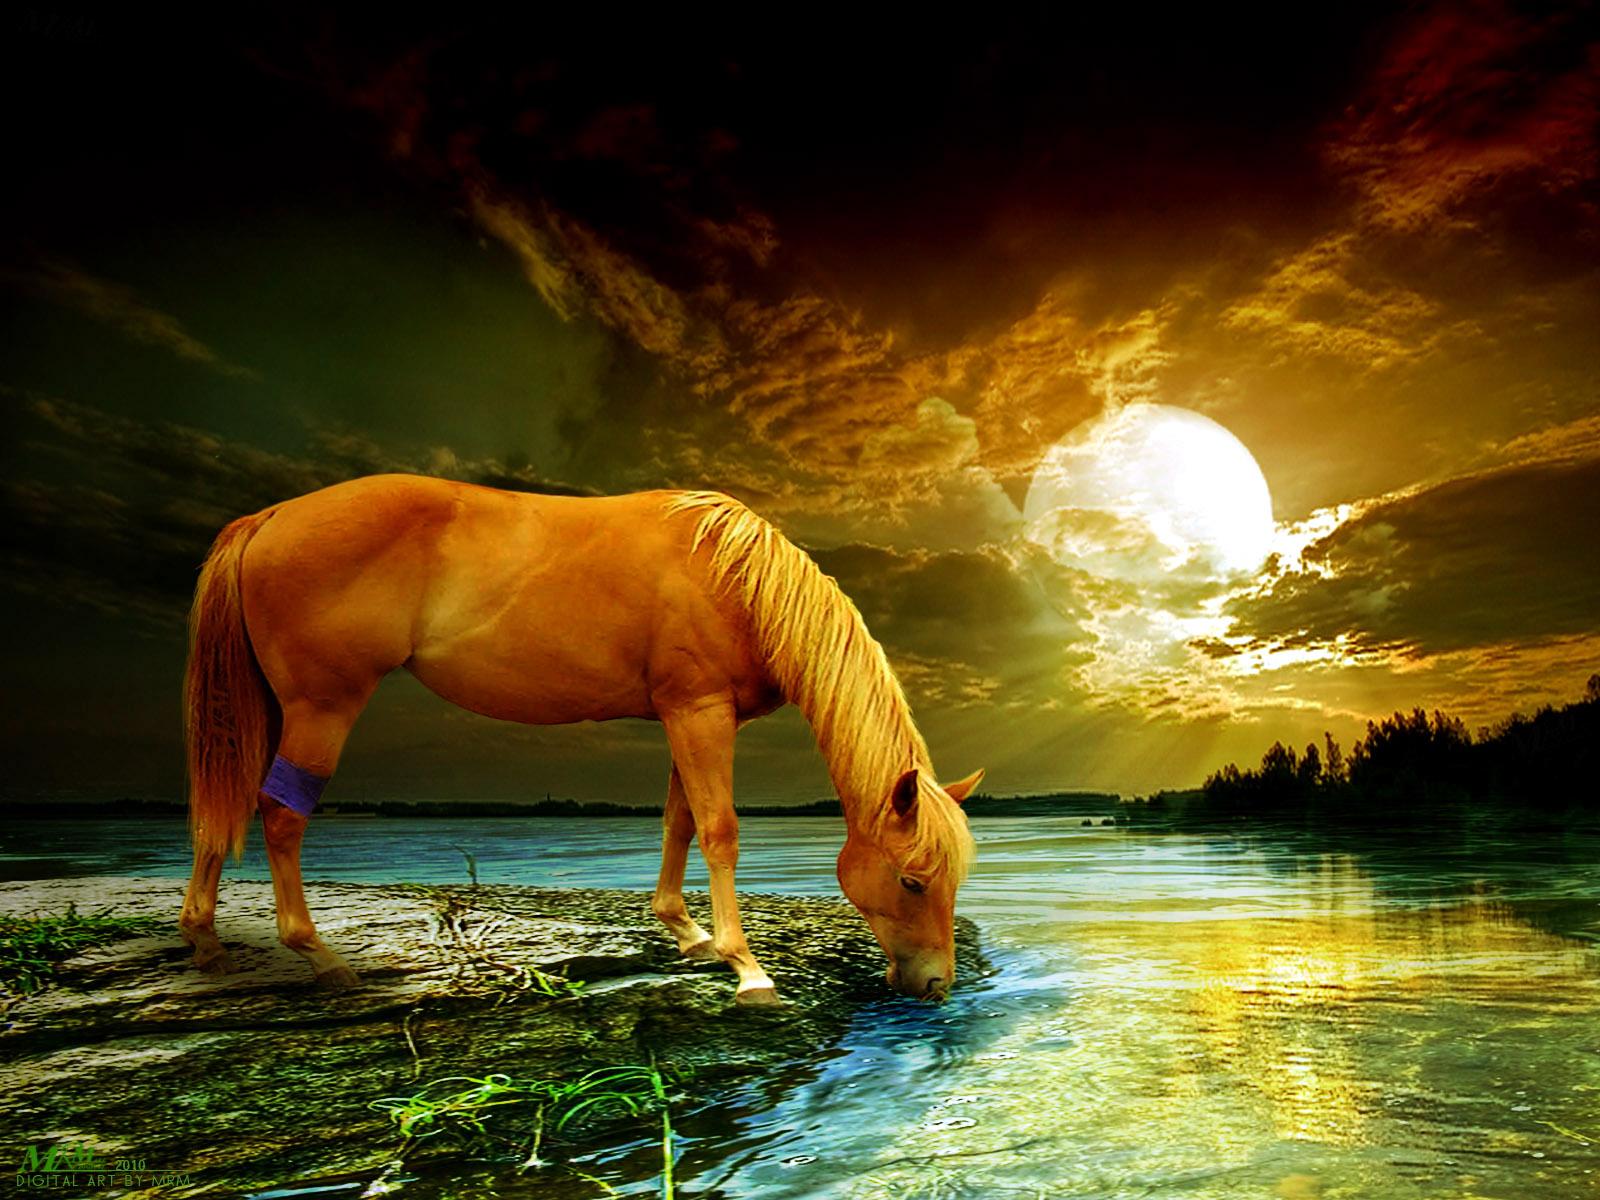 http://1.bp.blogspot.com/-MEivj1TP1Wc/TaEDHyU24uI/AAAAAAAAAq4/yNbWh6I48wo/s1600/wallpaper+Horse+Landscape-Photo+Manipulation+By+Mrm.jpg